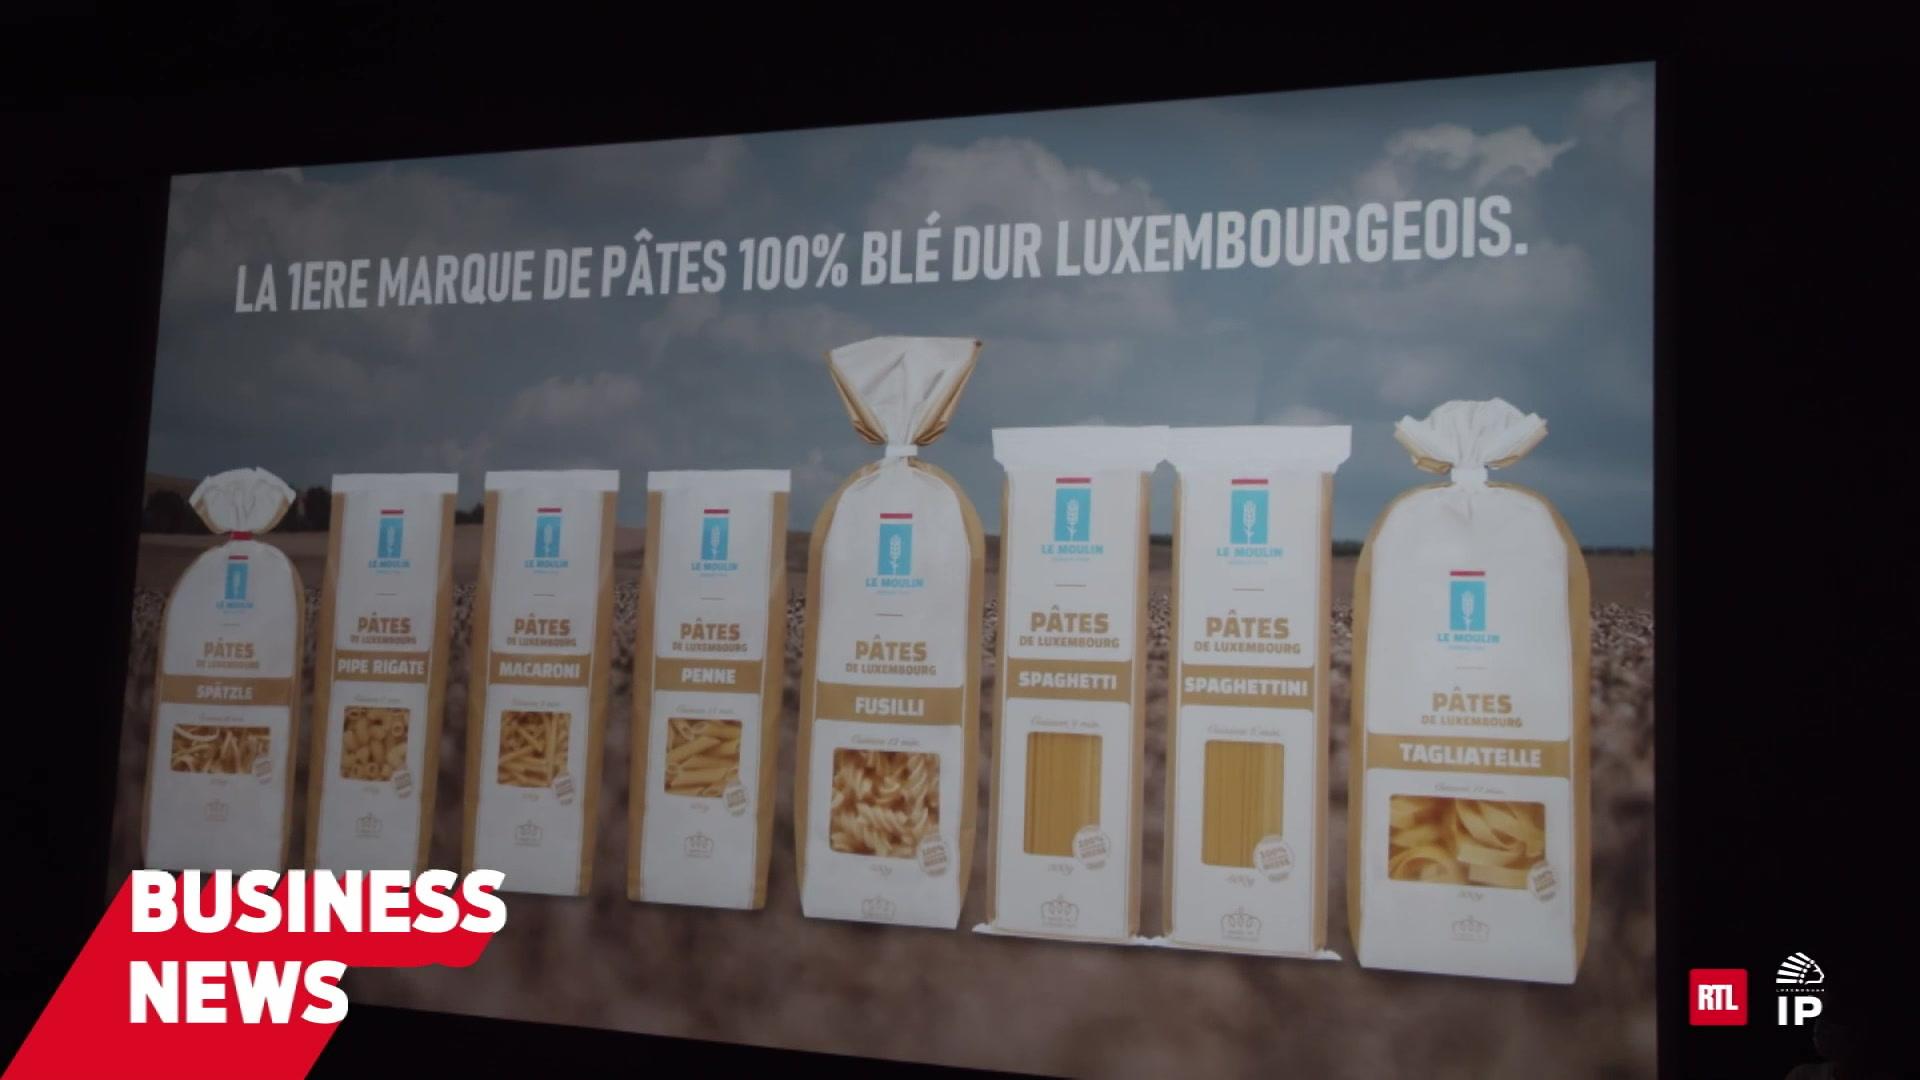 Moulins kleinbettingen luxembourg language mining bitcoins explained